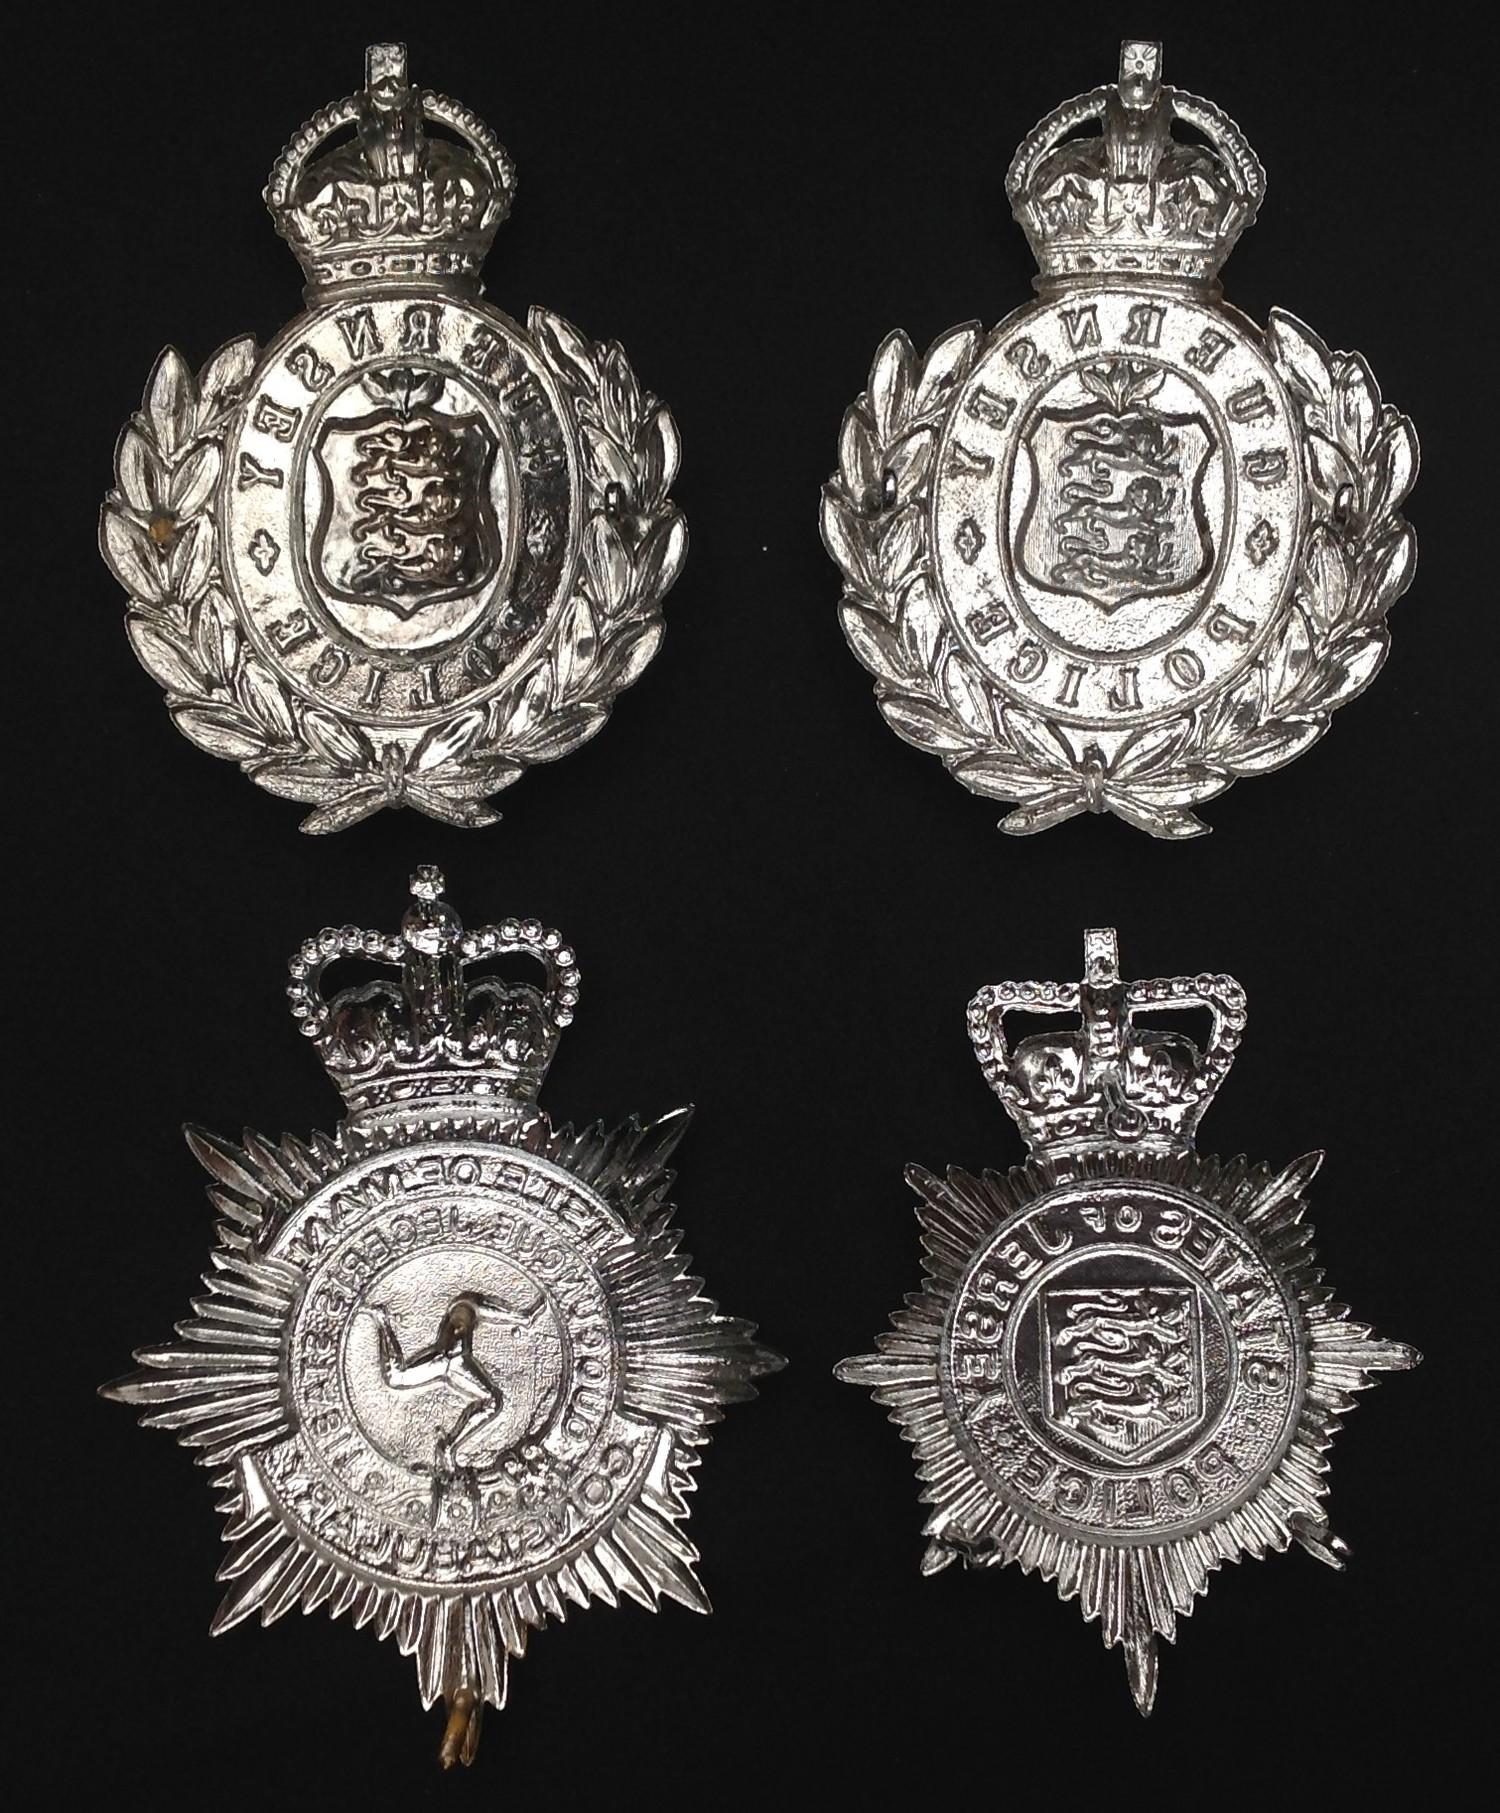 Kings Crown Guernsey Police Helmet Plates x 2: Queens Crown States of Jersey Helmet Plate: Queens - Image 2 of 2